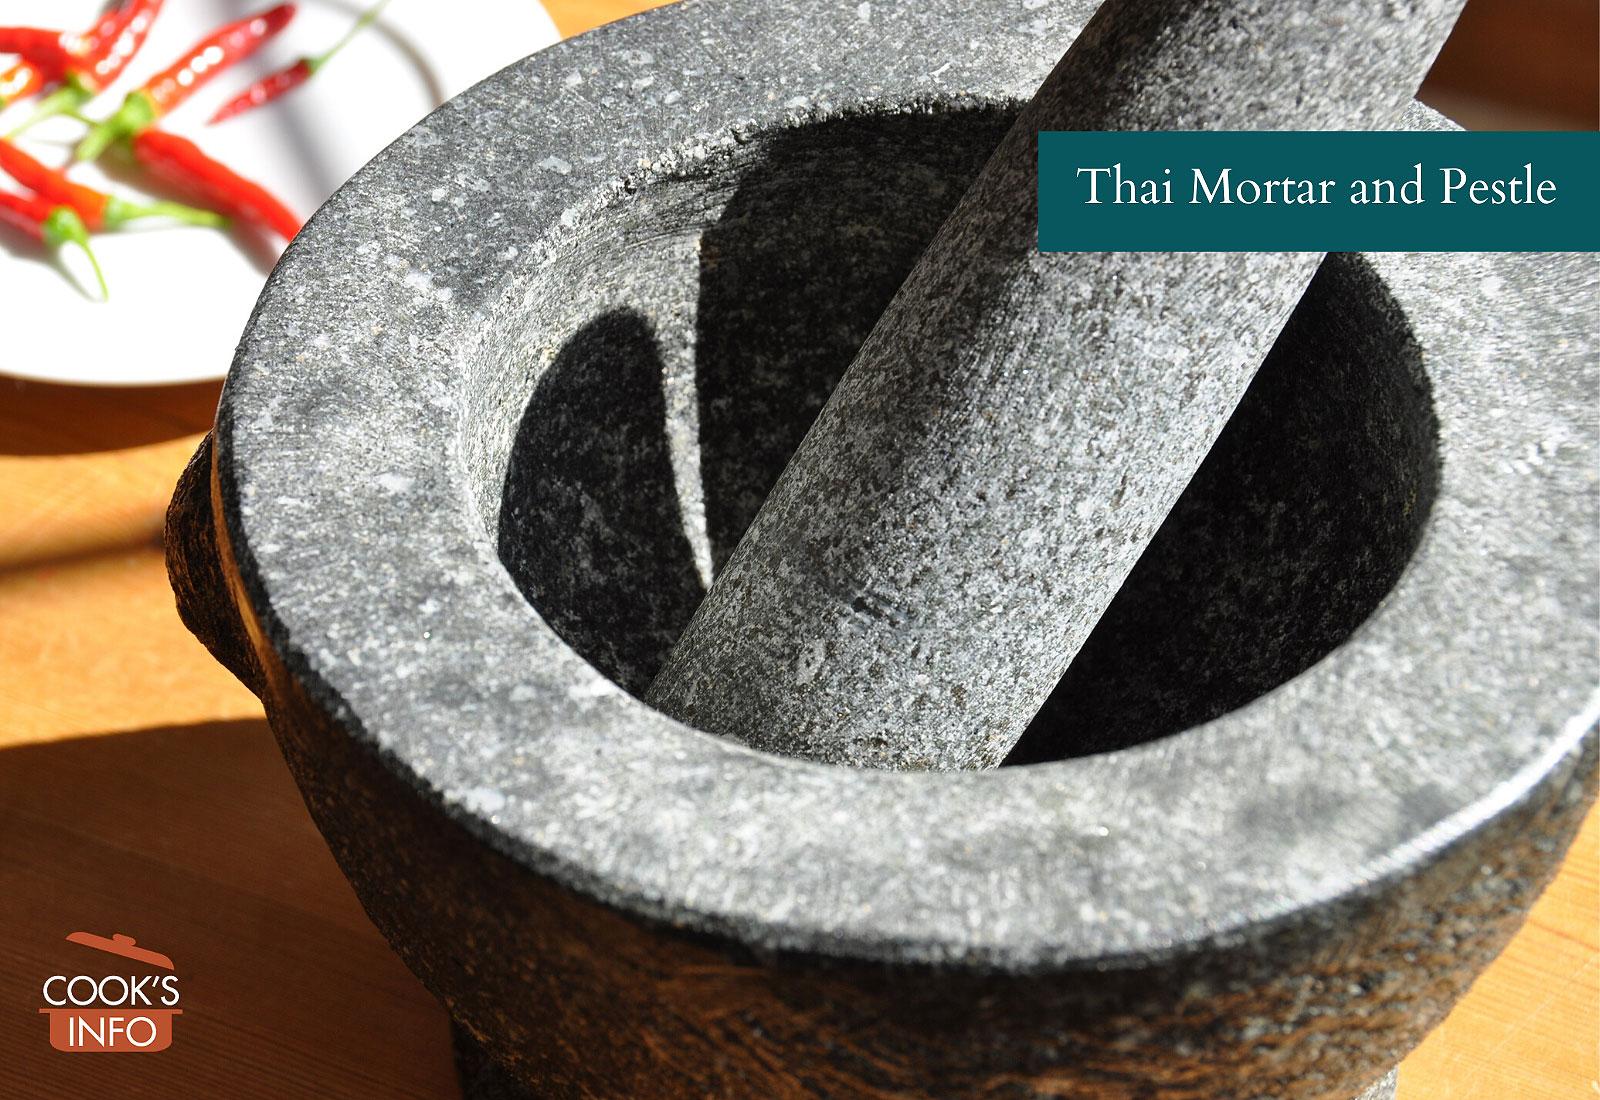 Stone Thai mortar and pestle